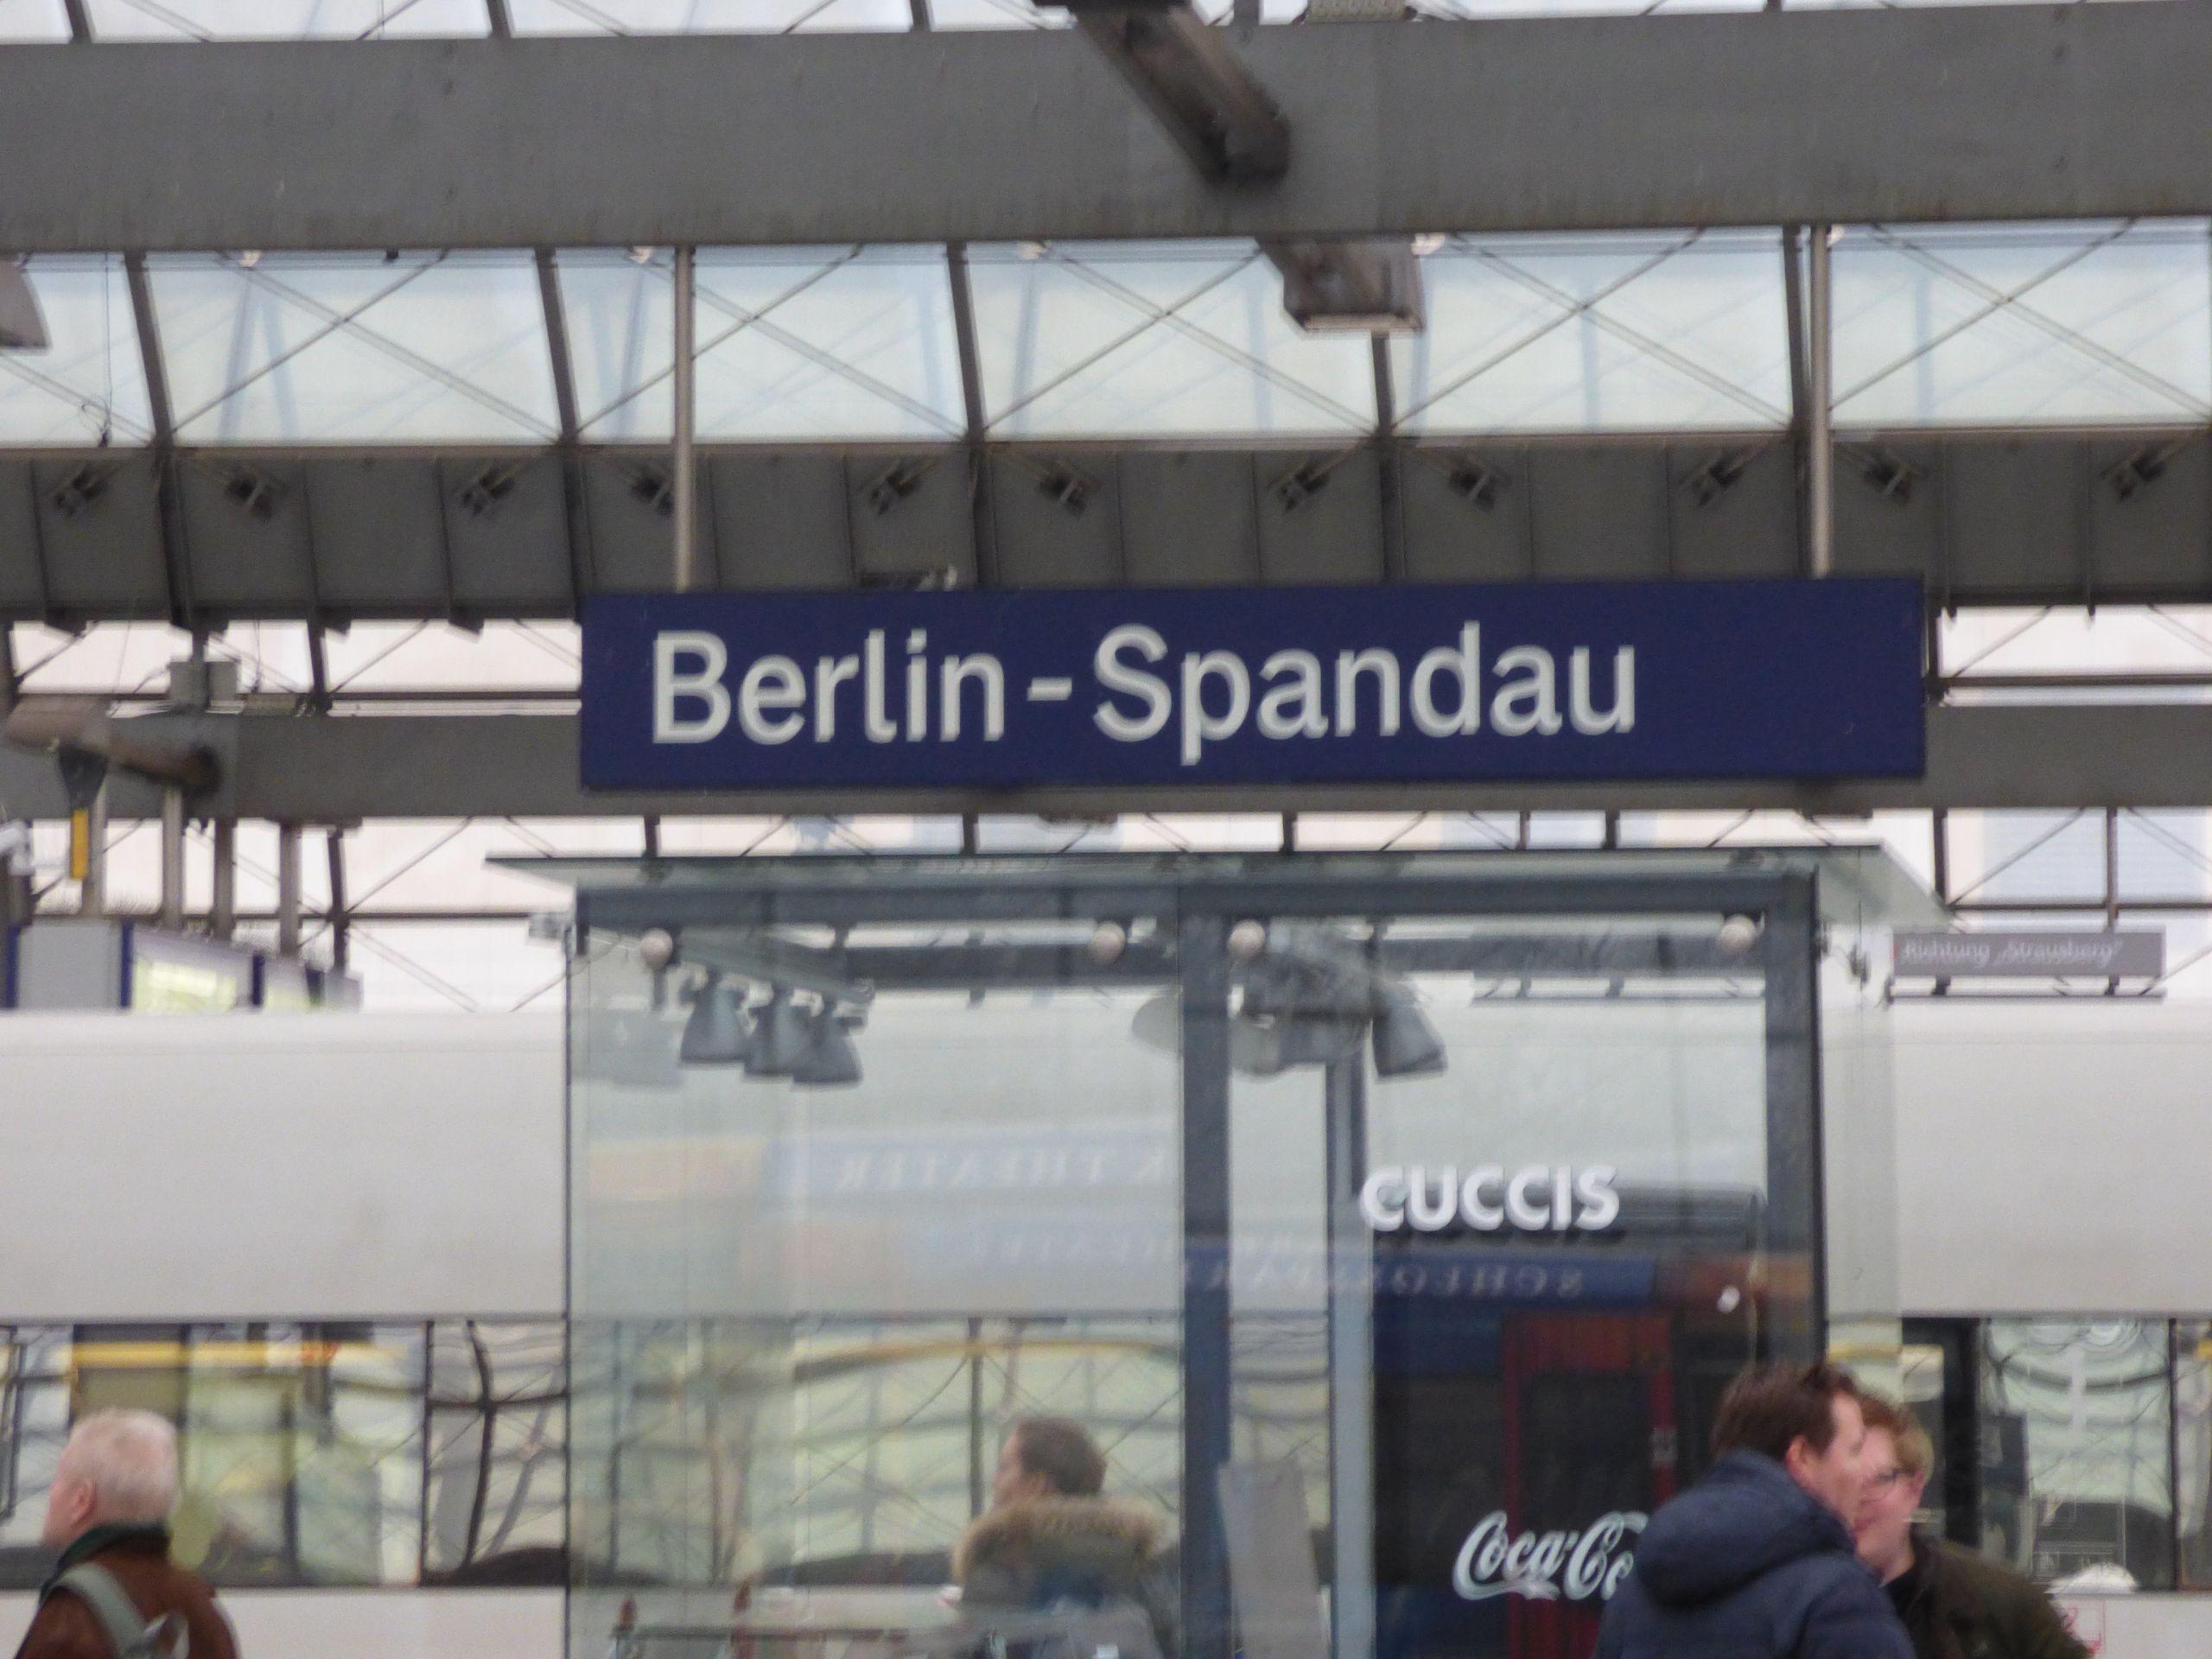 Bahnhof Zoologischer Garten Berlin Schön Berlin Bummel Zwischen Bahnhof Zoo Kranzler Und Hugendubel